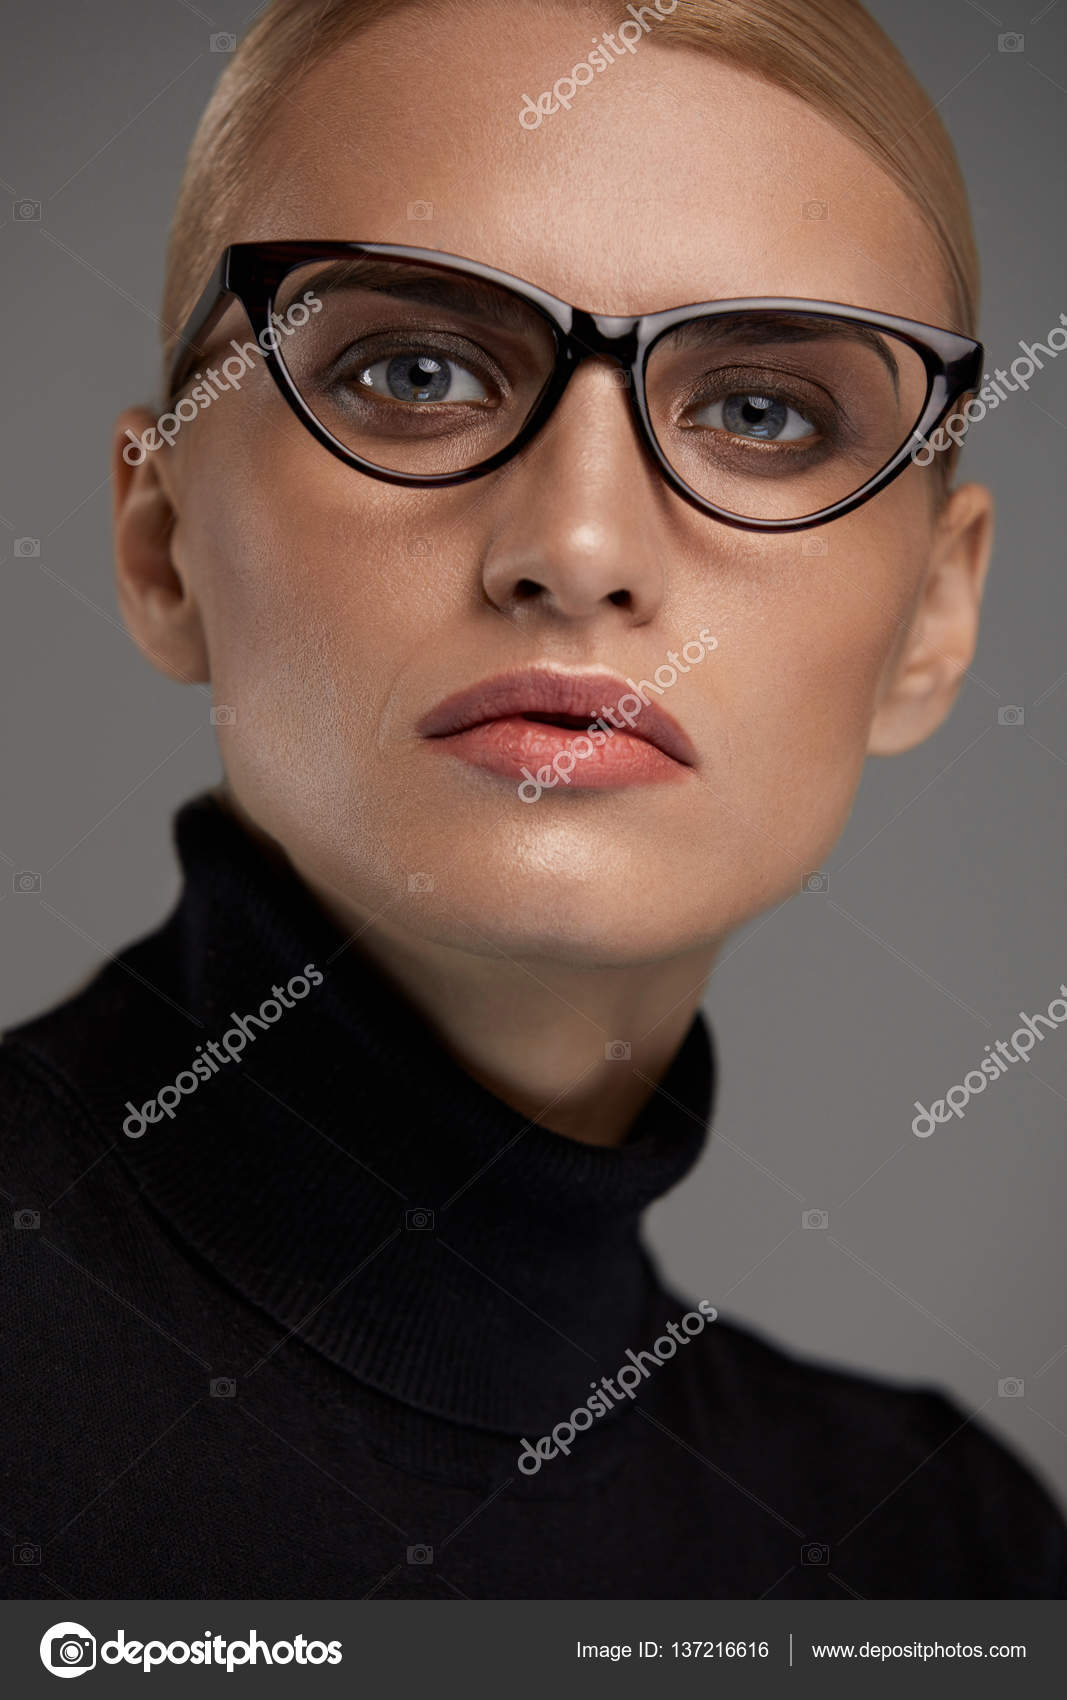 Gafas de moda de las mujeres. Niña en marco de gafas, lentes con ...